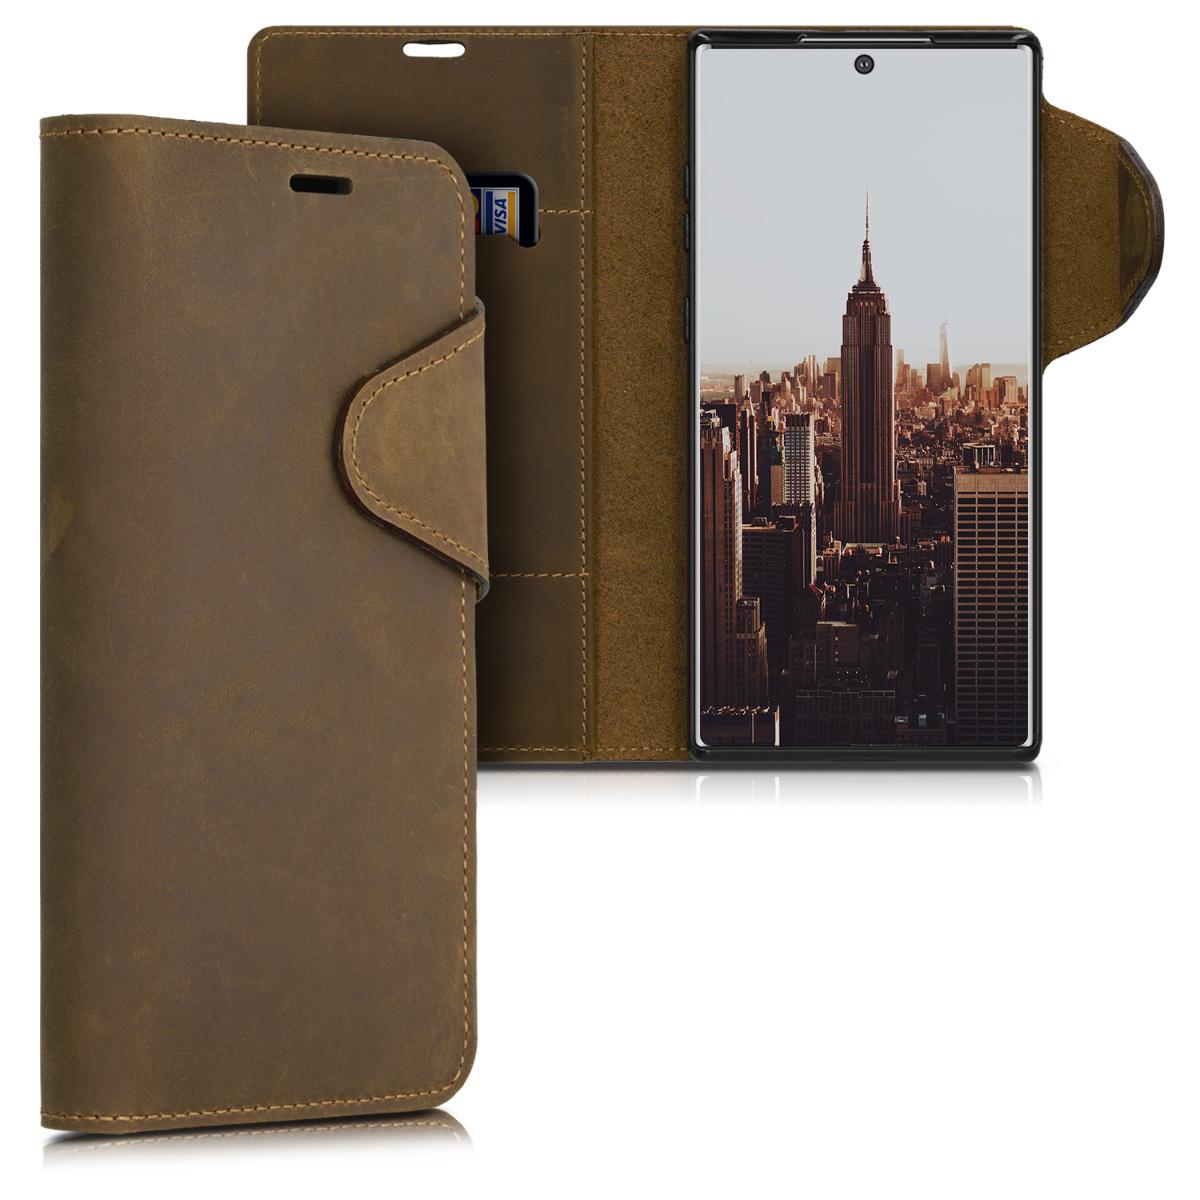 Kalibri Δερμάτινη Suede Θήκη - Πορτοφόλι Samsung Galaxy Note 10 Plus - Brown (49355.05)